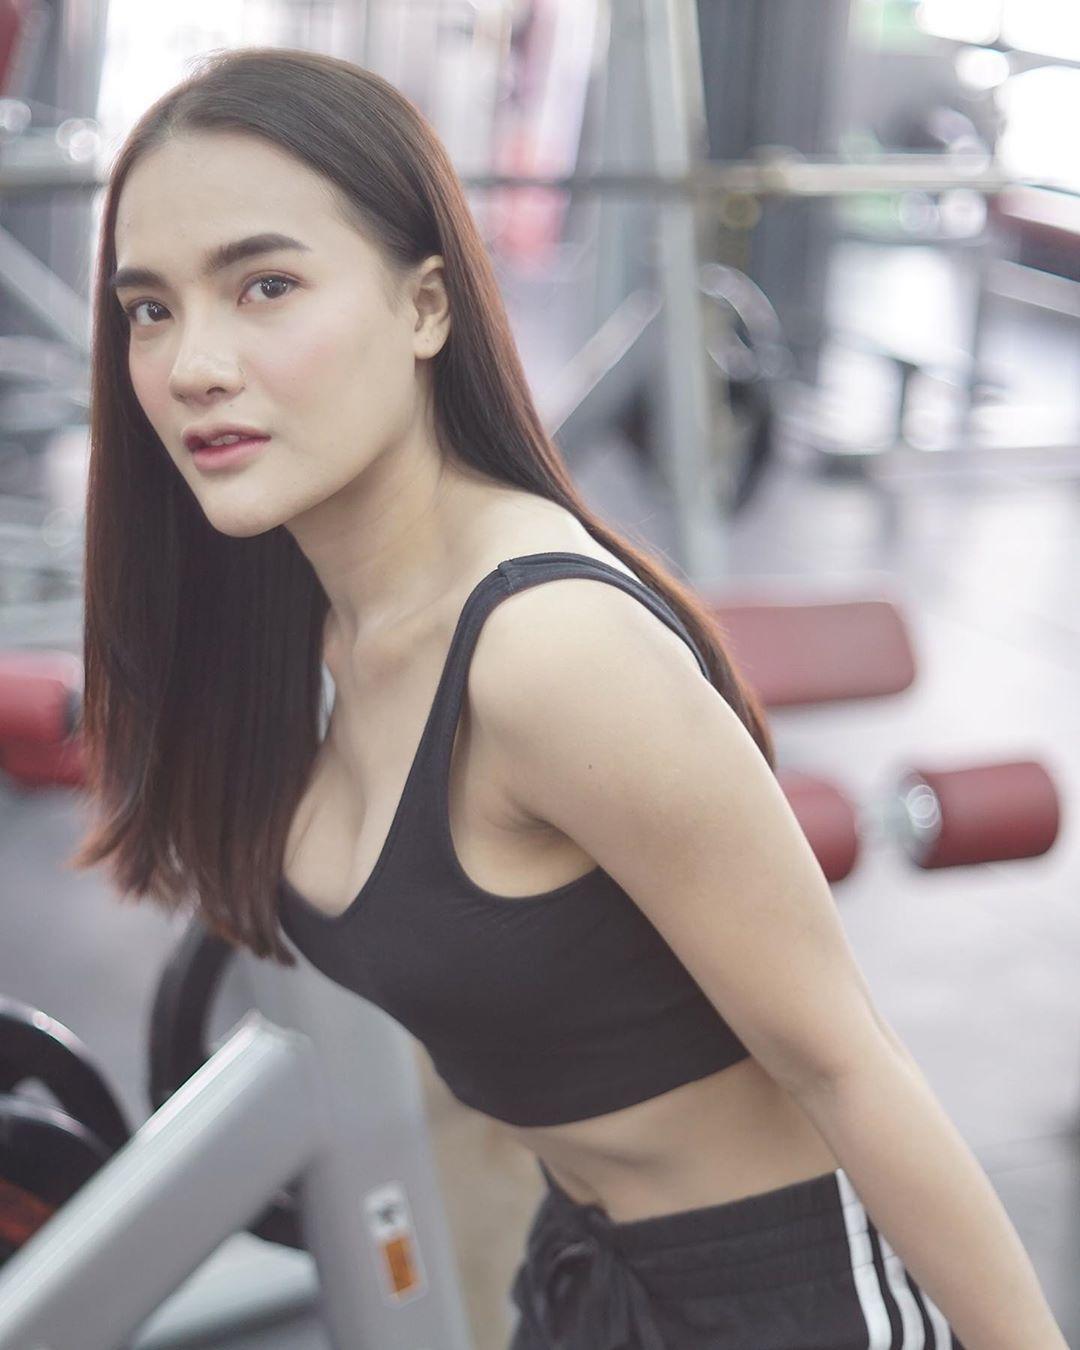 #howtoperfect #howtobeauty #fitness #fitnessmotivation #fitnessmodel #fitnessadd